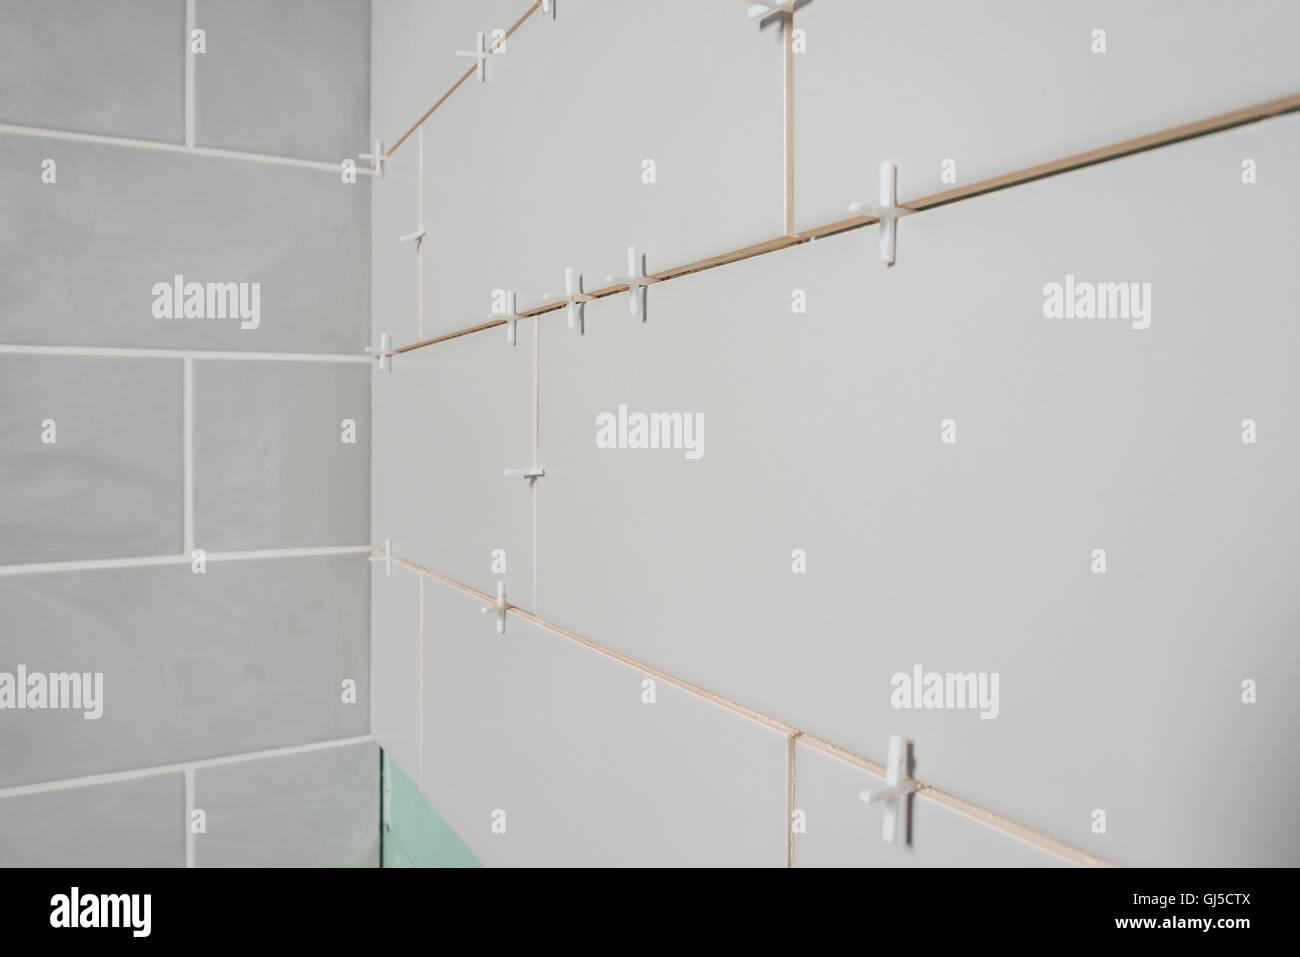 Bathroom Tiling Stock Photos & Bathroom Tiling Stock Images - Alamy